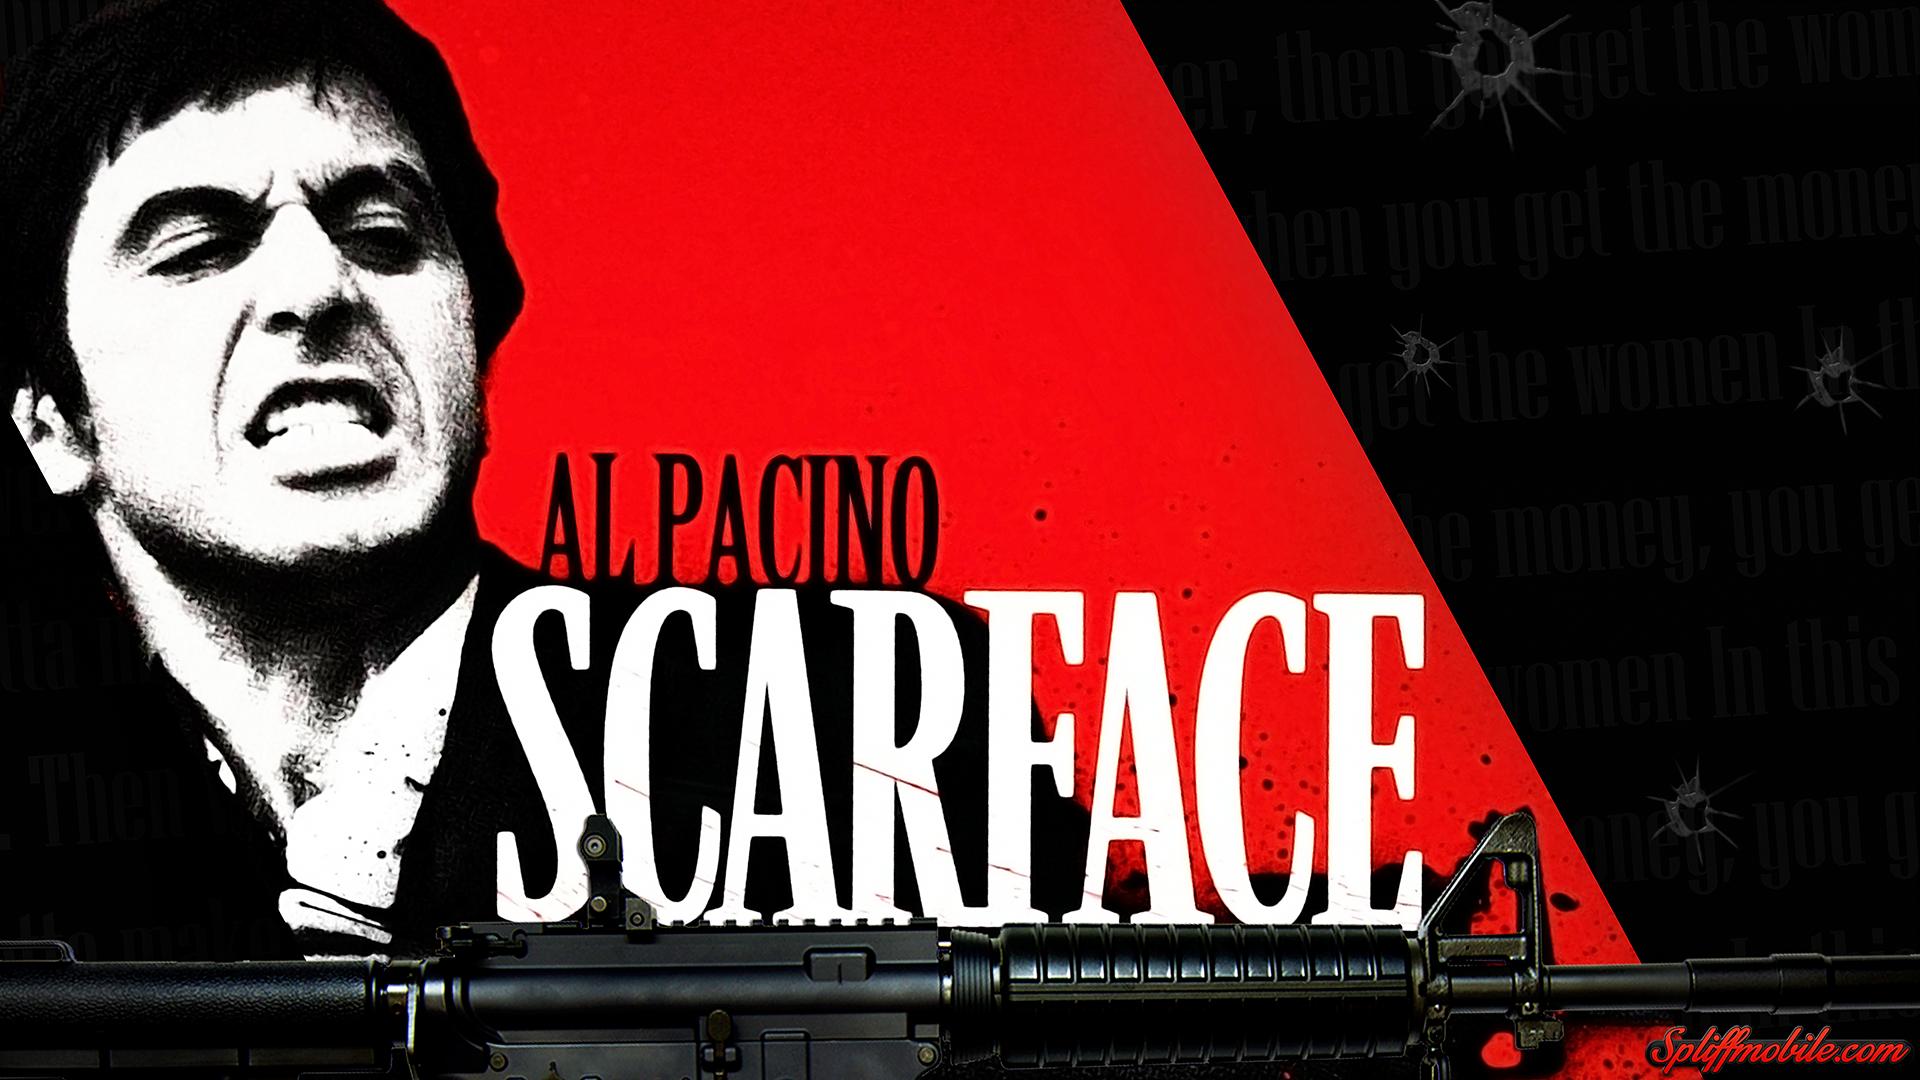 Scarface wallpaper hd wallpapersafari - Scarface background ...